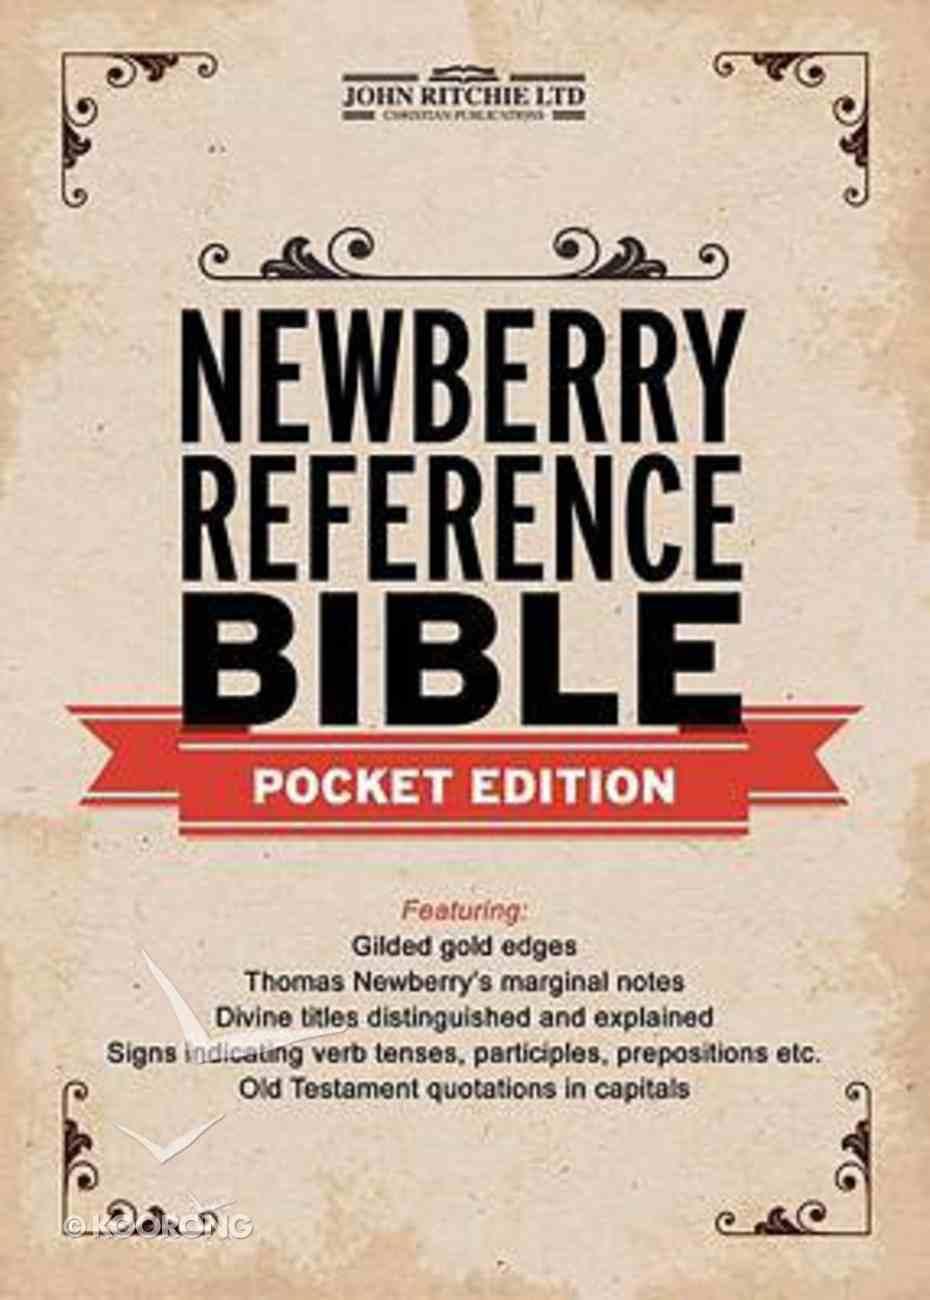 KJV Newberry Reference Bible Pocket Edition Genuine Leather